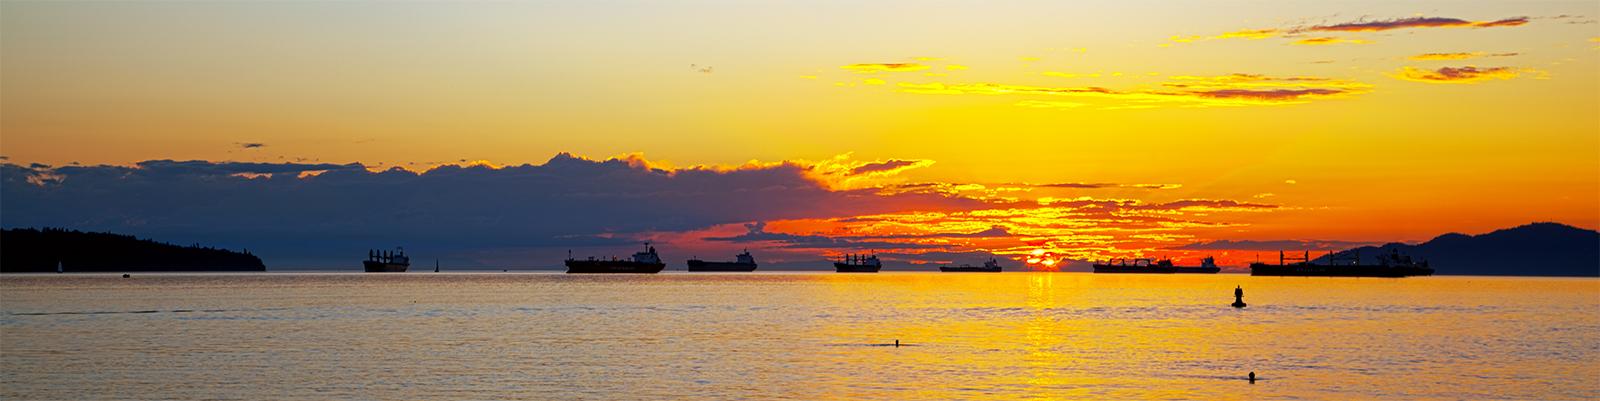 VANCOUVER - SUNSET AT ENGLISH BAY